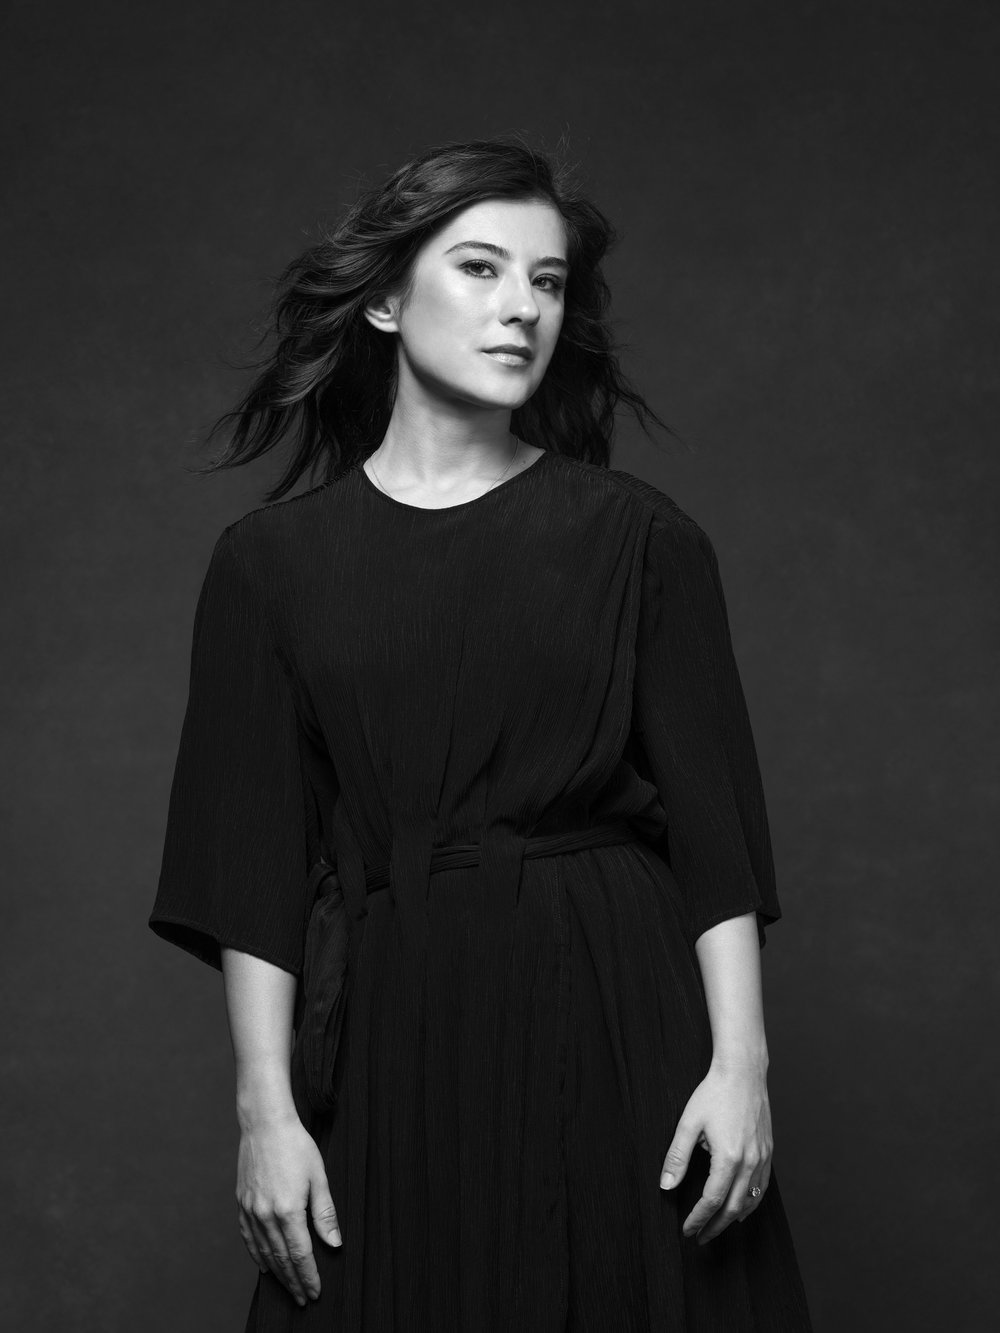 Paola Rojas-476B&W.jpg